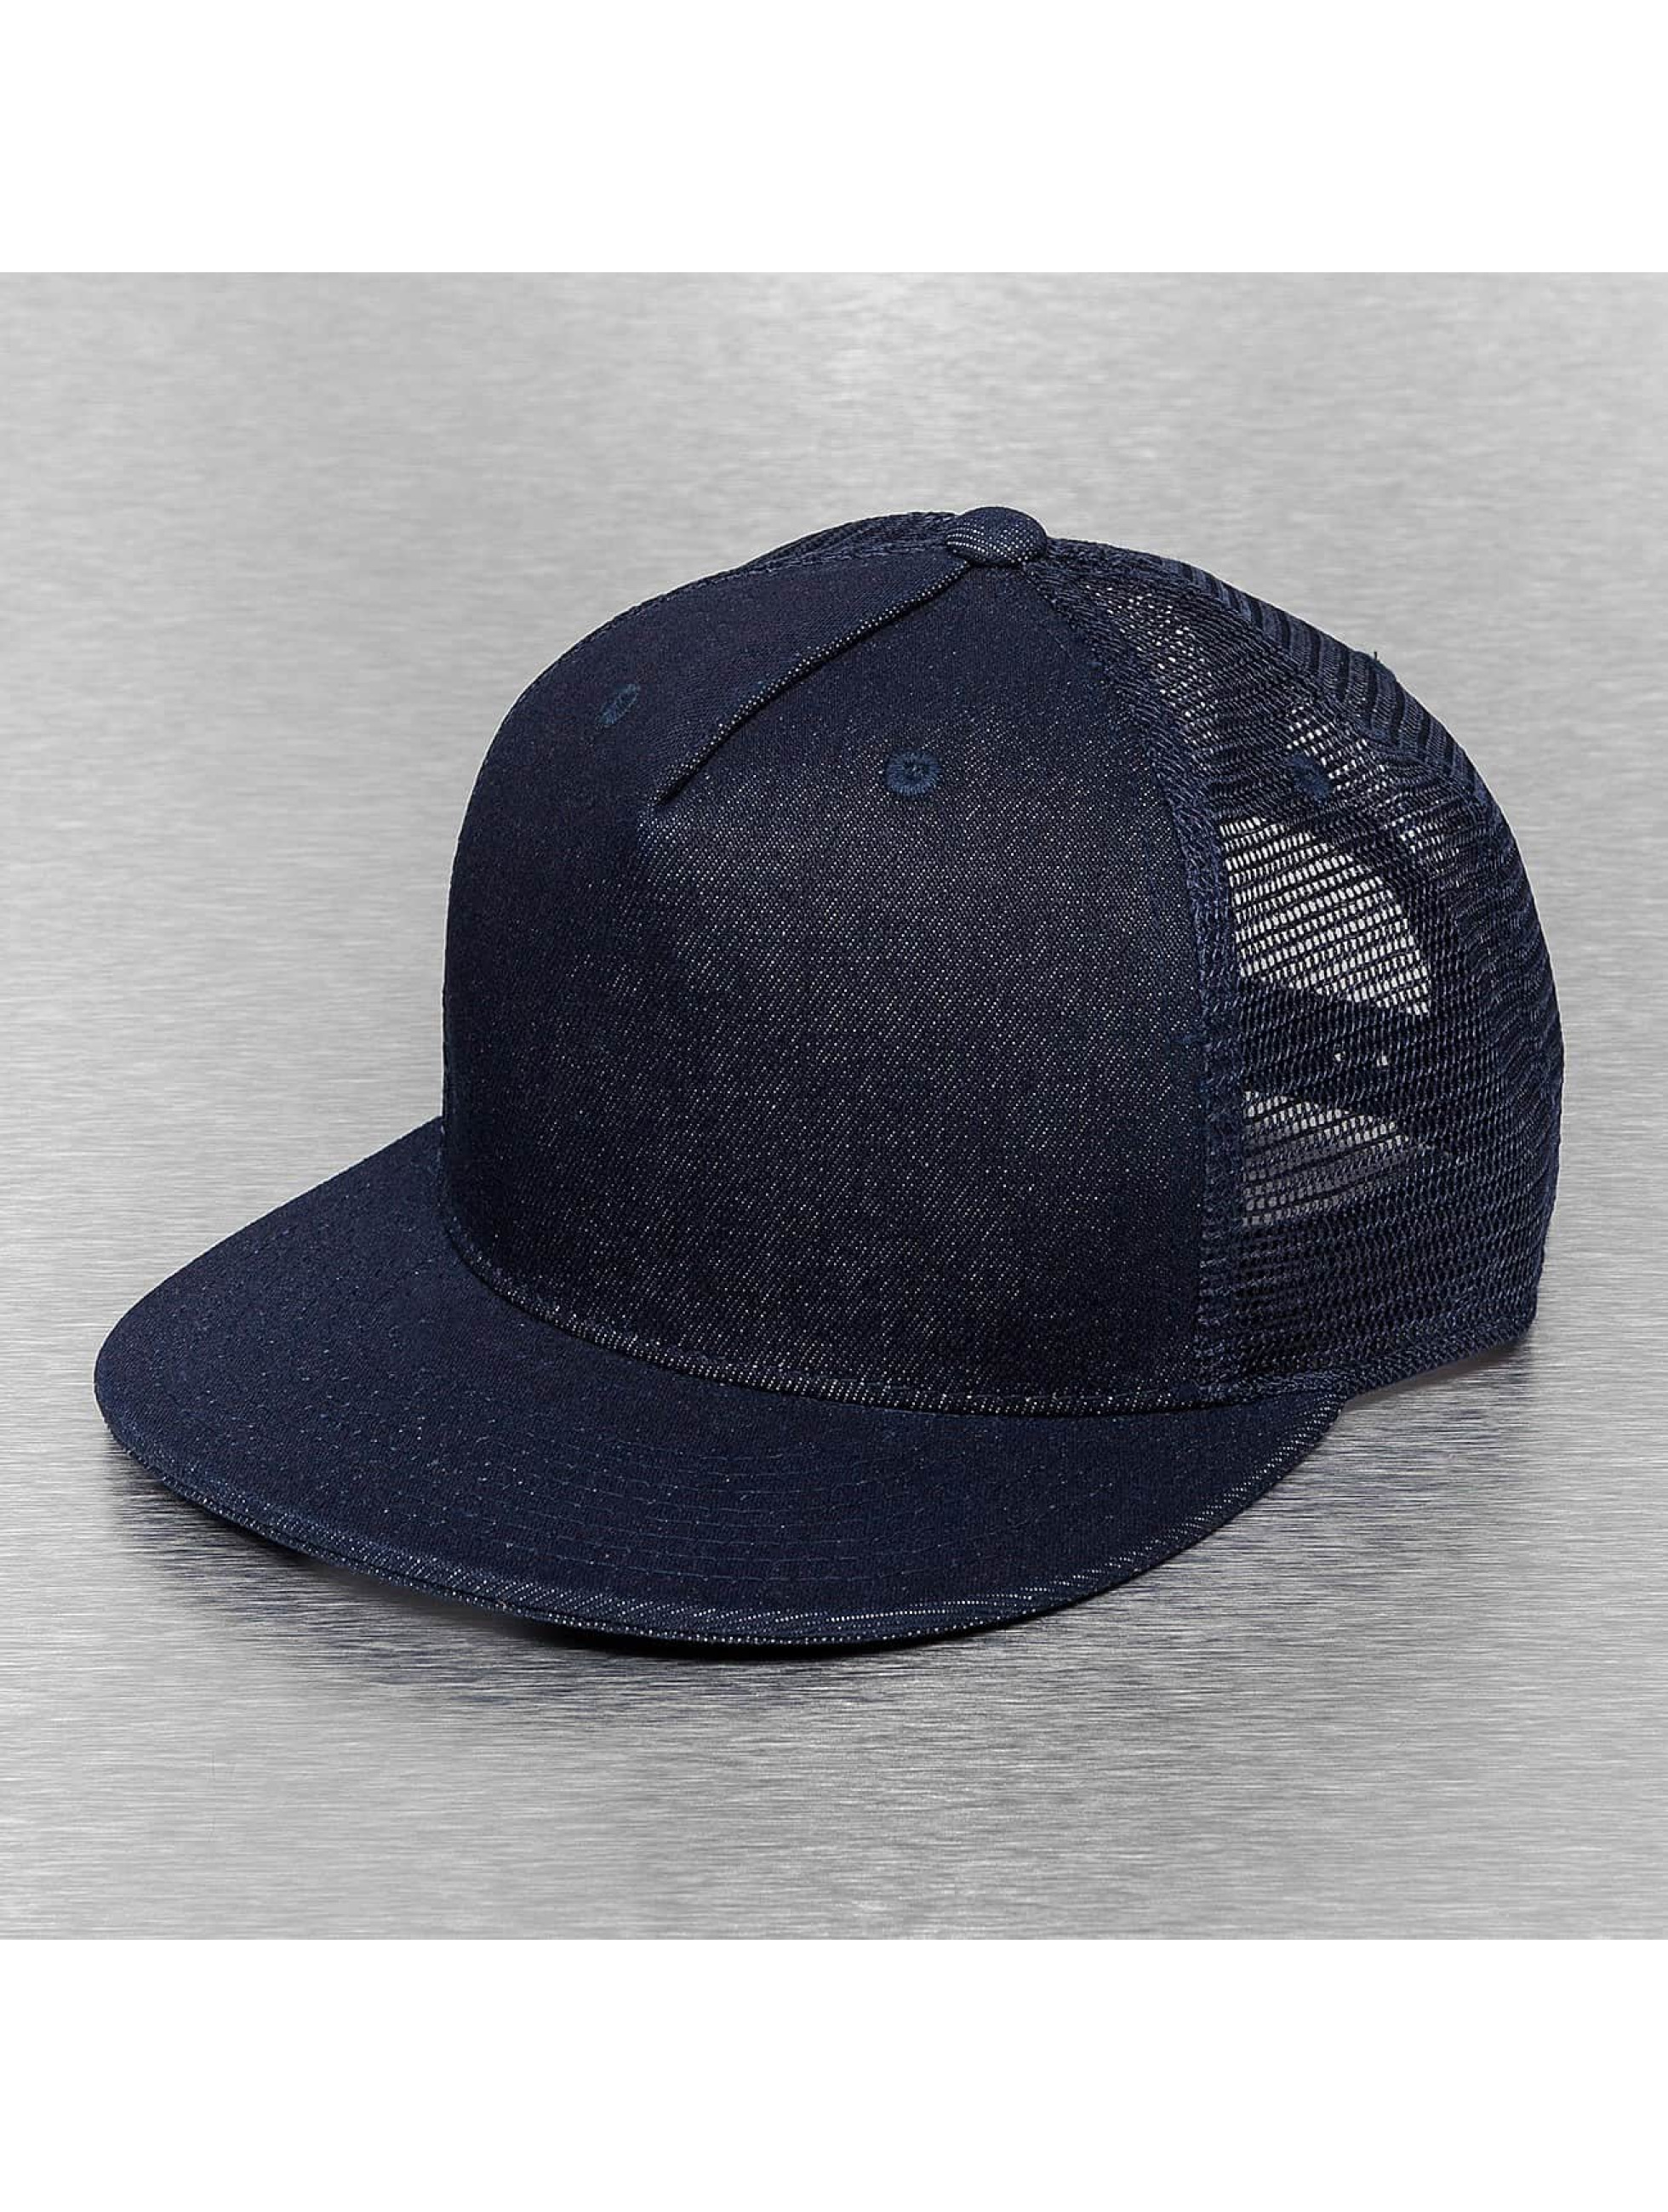 Cap Crony Casquette Trucker mesh Denim bleu